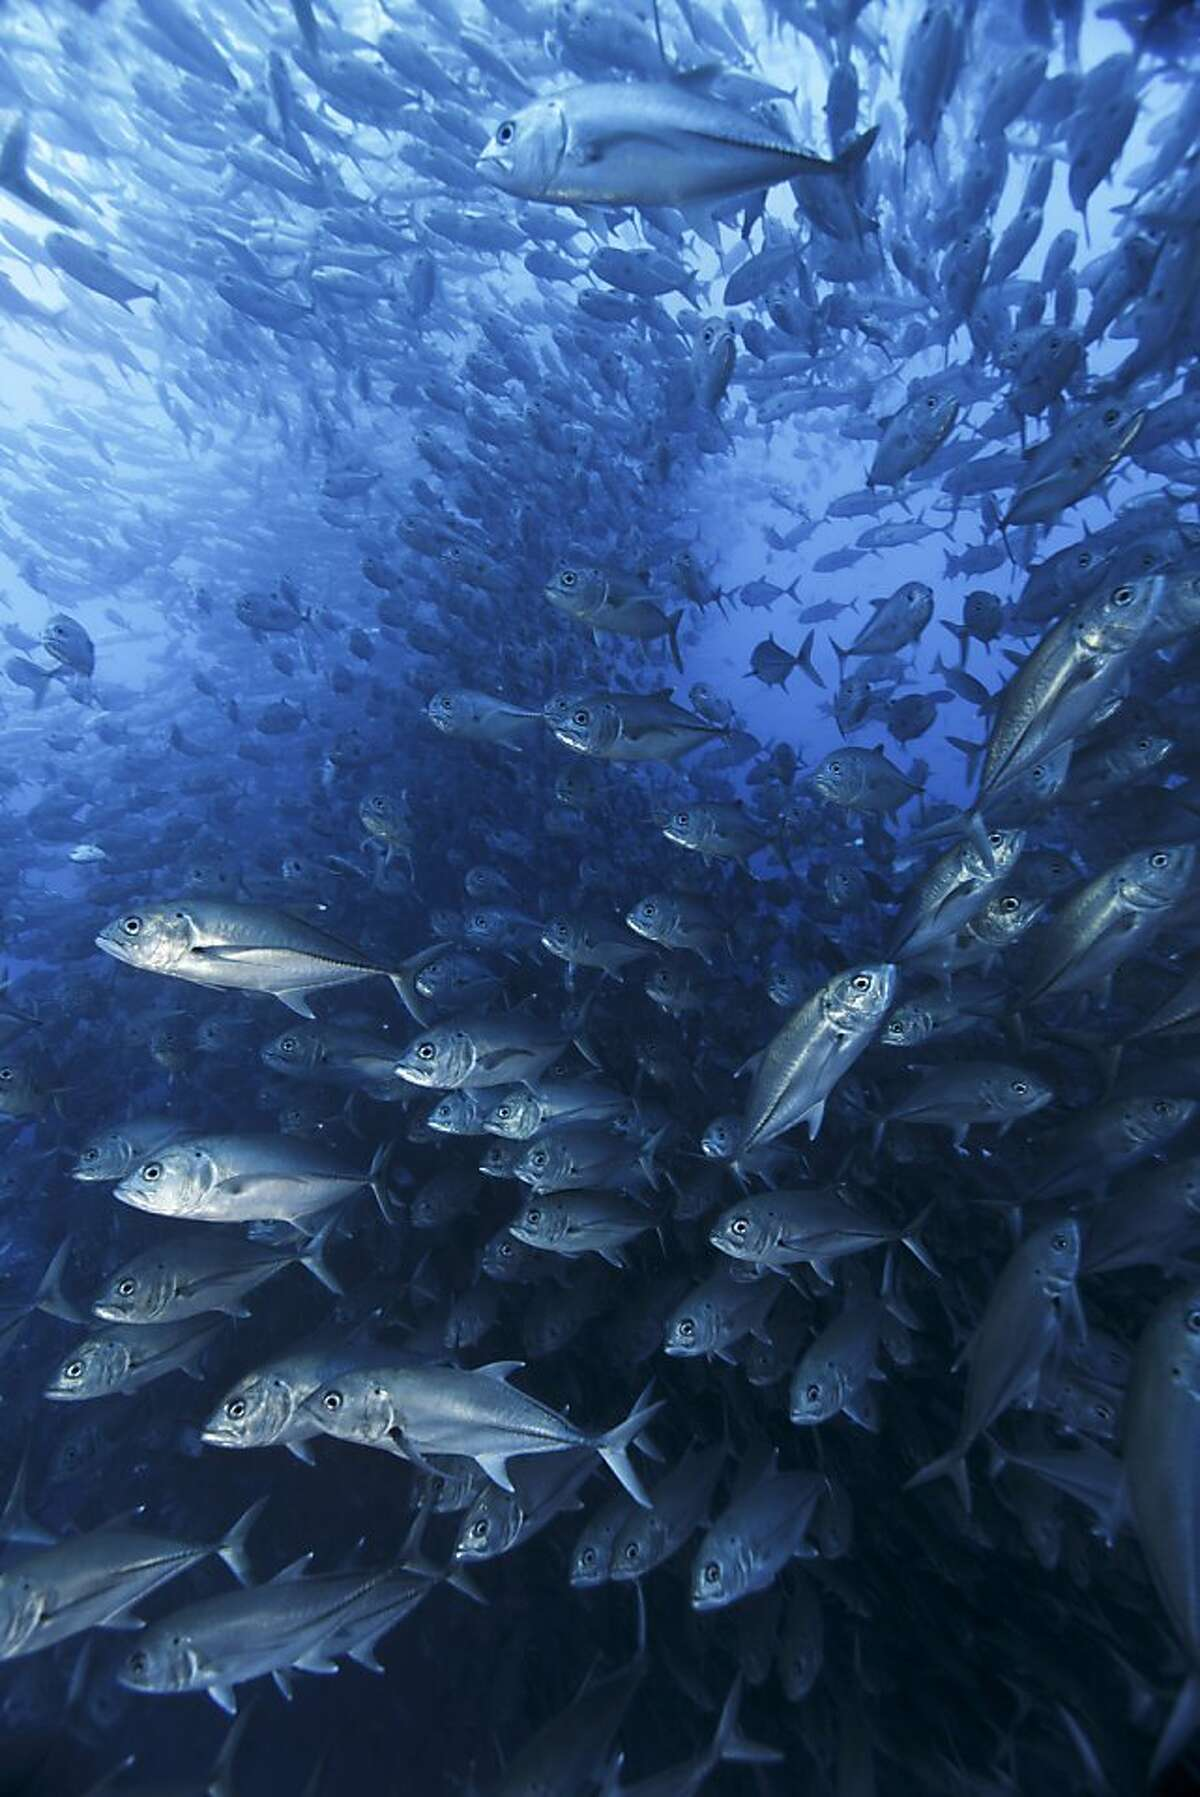 A giant school of bigeye trevallies off the coast of Costa Rica.